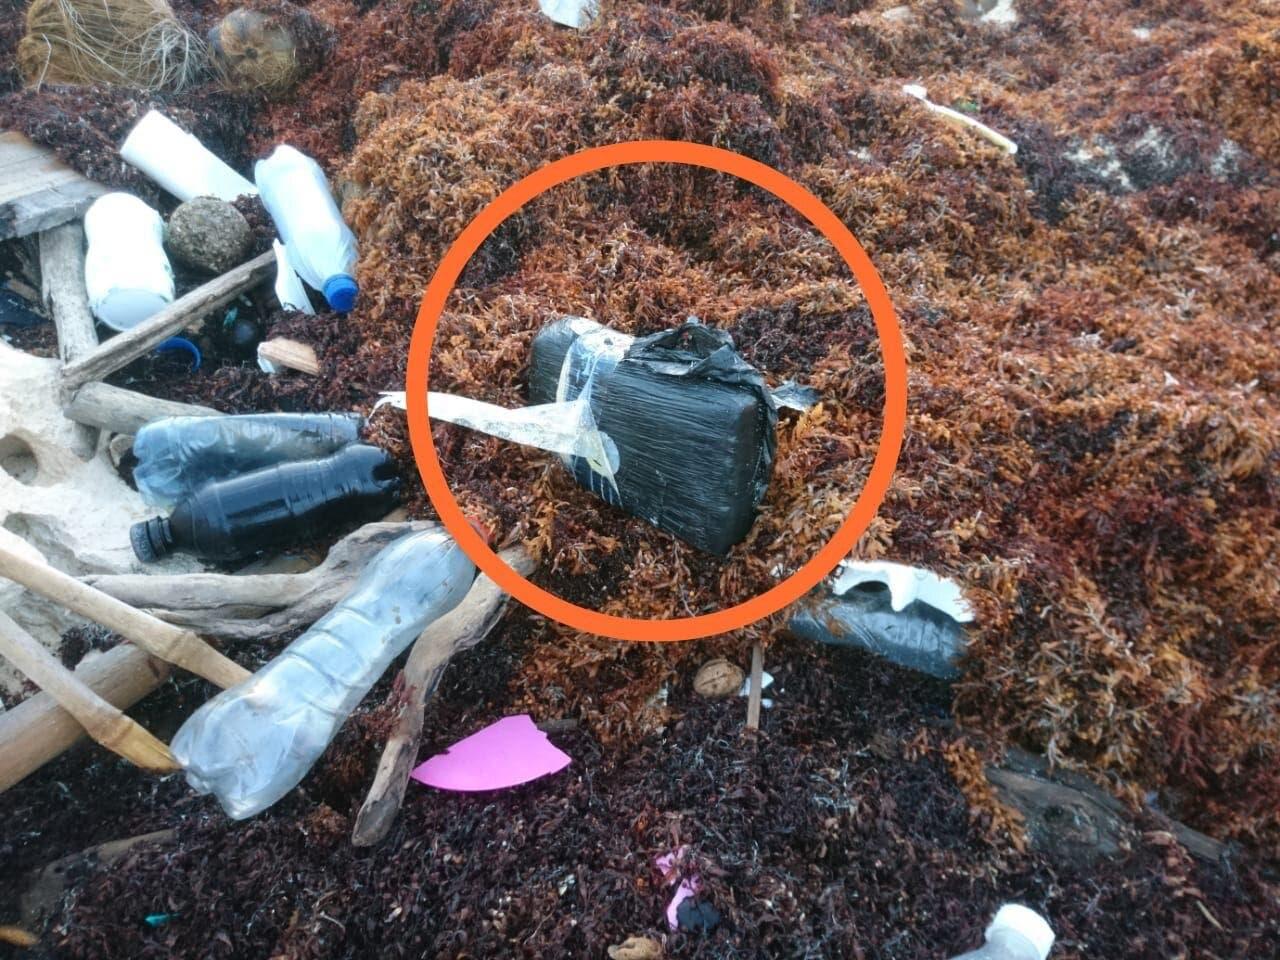 Sedena asegura recale de paquete de presunta cocaína en aguas de Cozumel